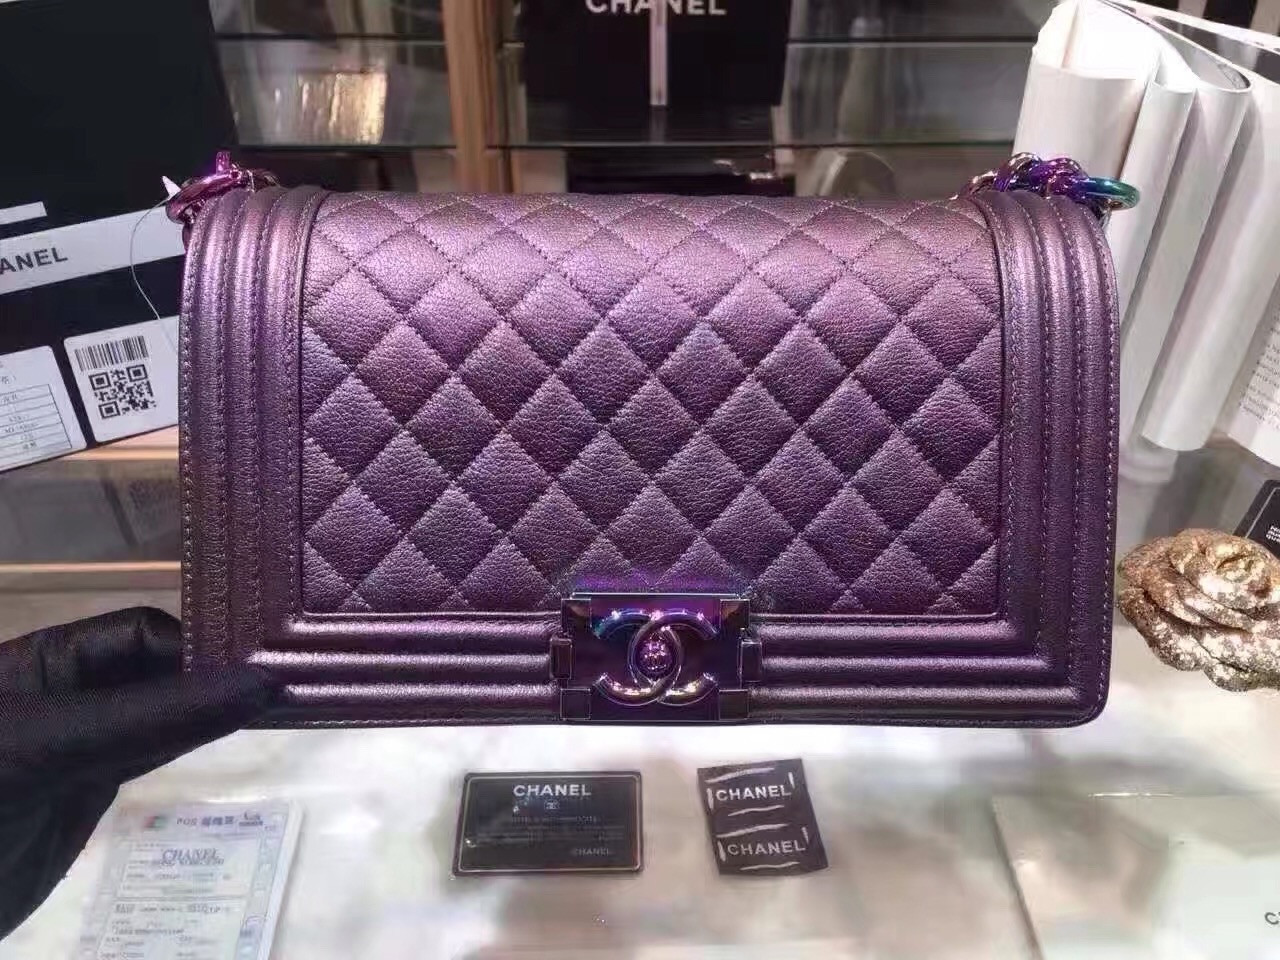 6f14c5e4c1ca CHANEL Medium Purple Iridescent Rainbow Boy Flap Bag Cruise 2016 Seoul  Collection A67085